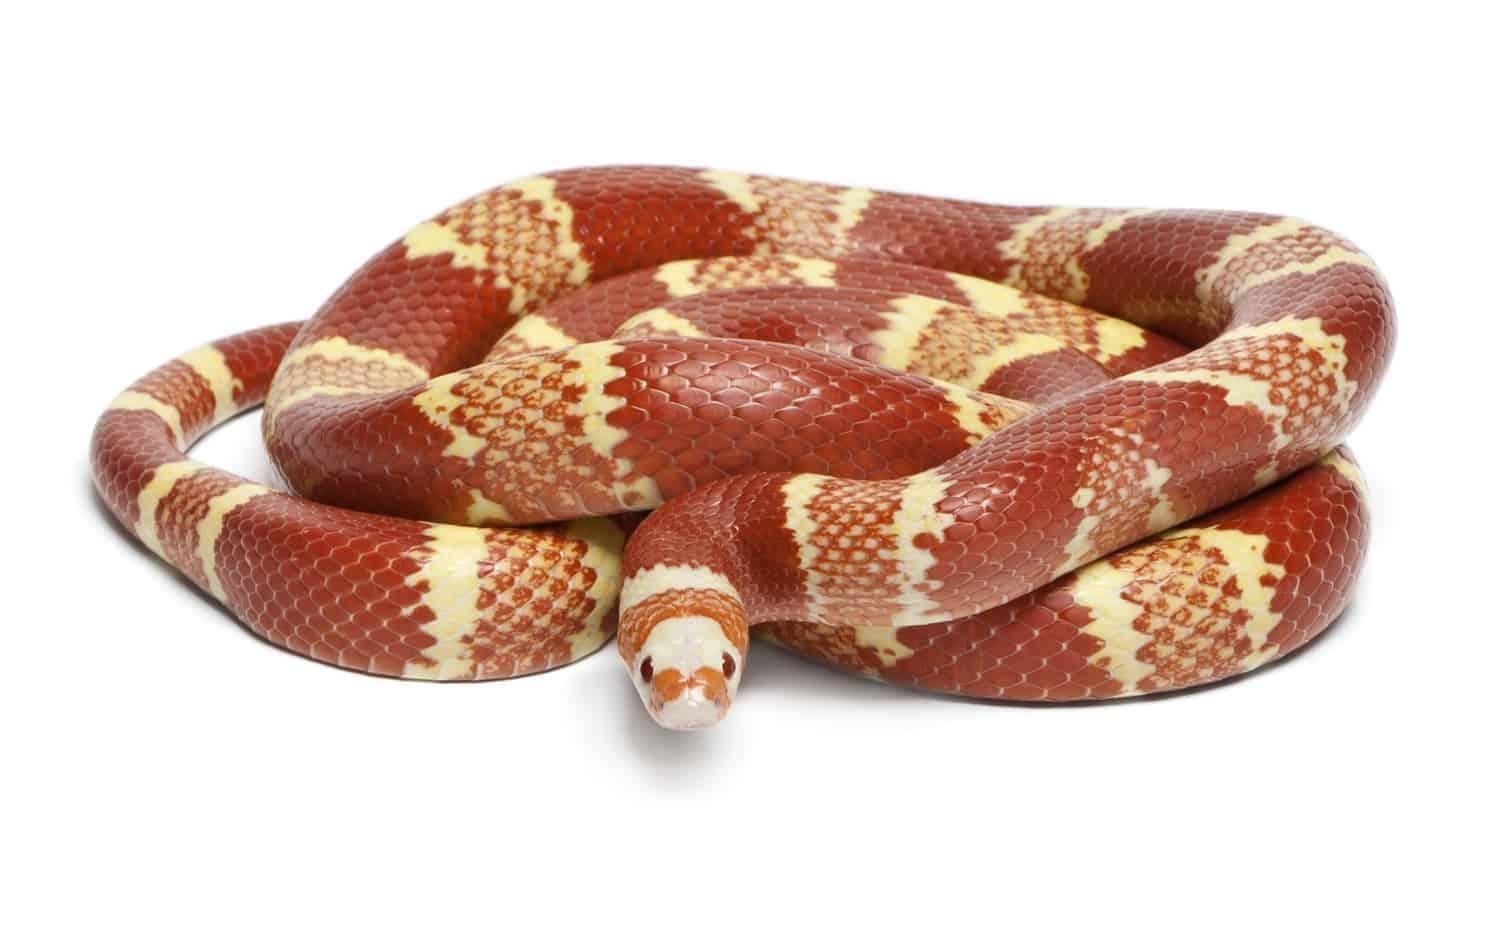 What Happens When a Milk Snake Bites?